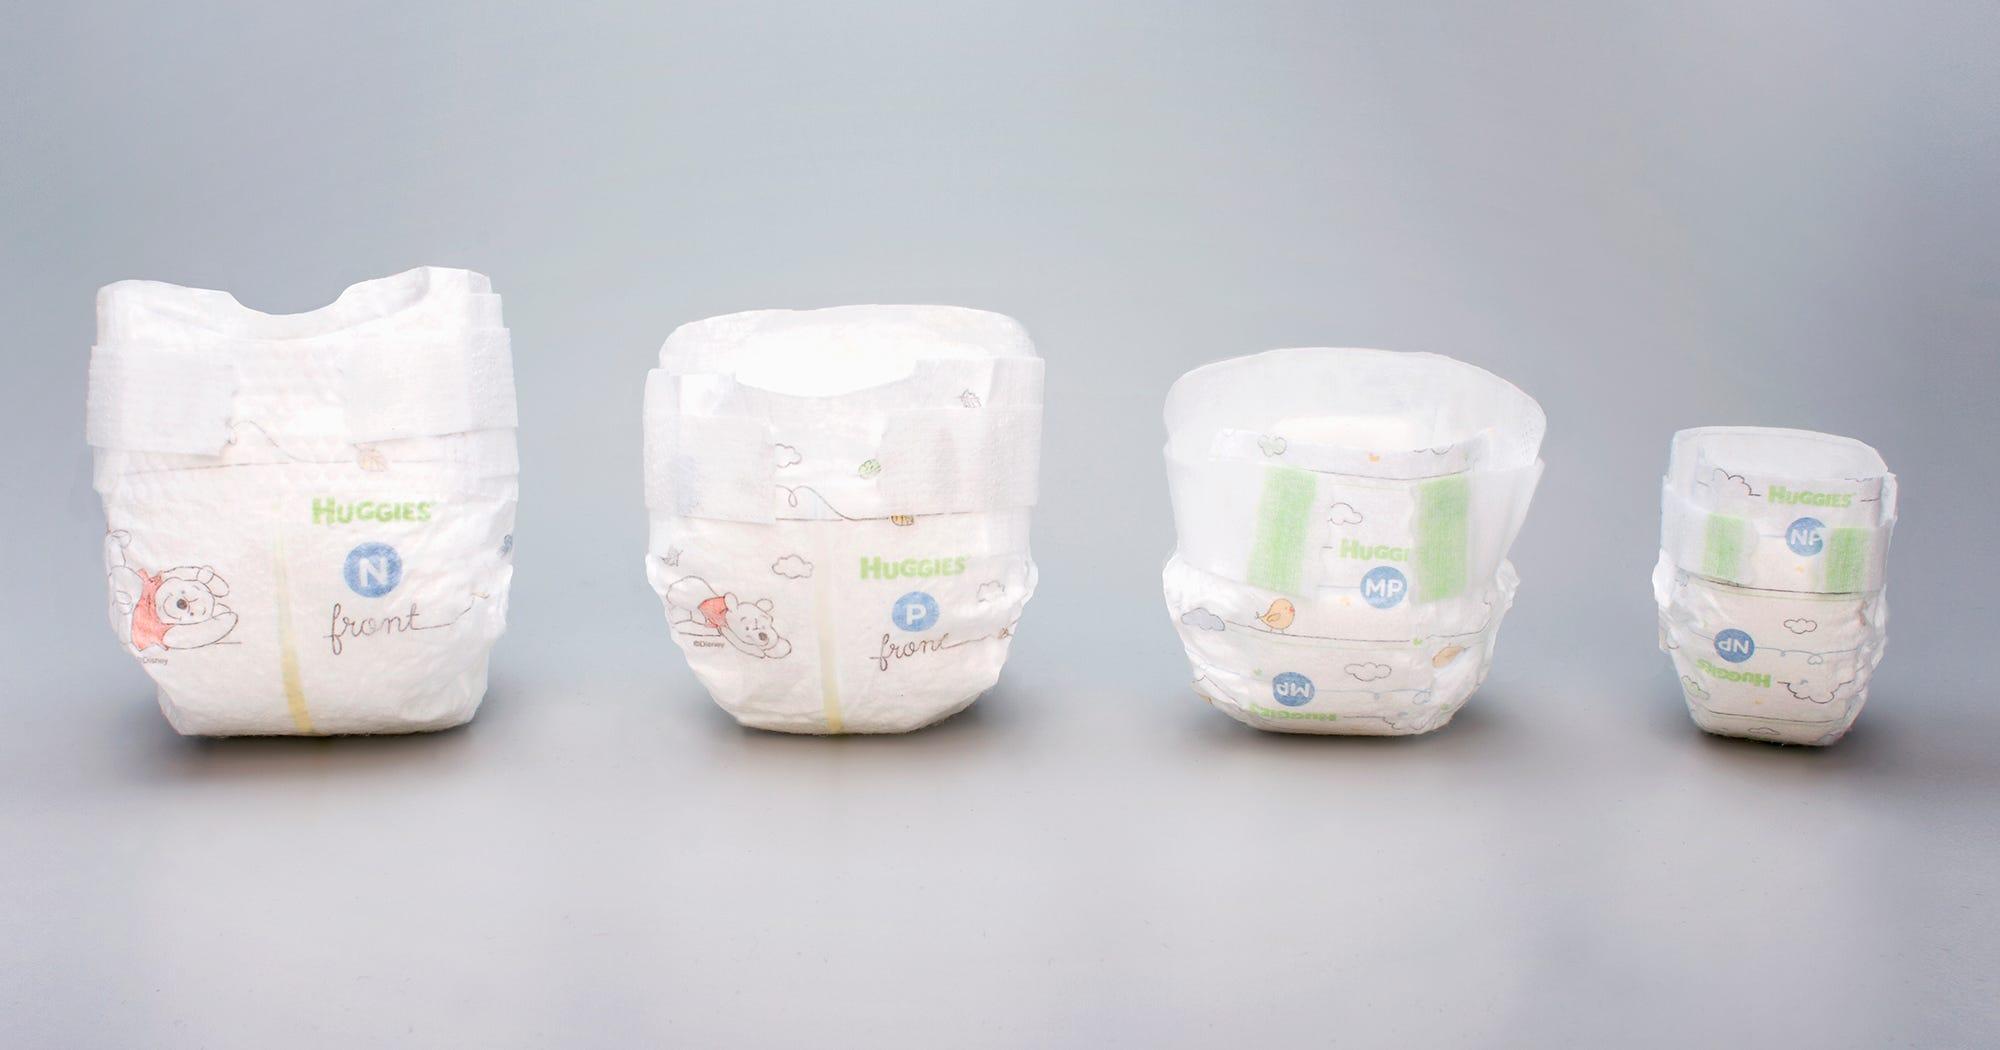 Huggies Makes Tiny Diapers For Preemies